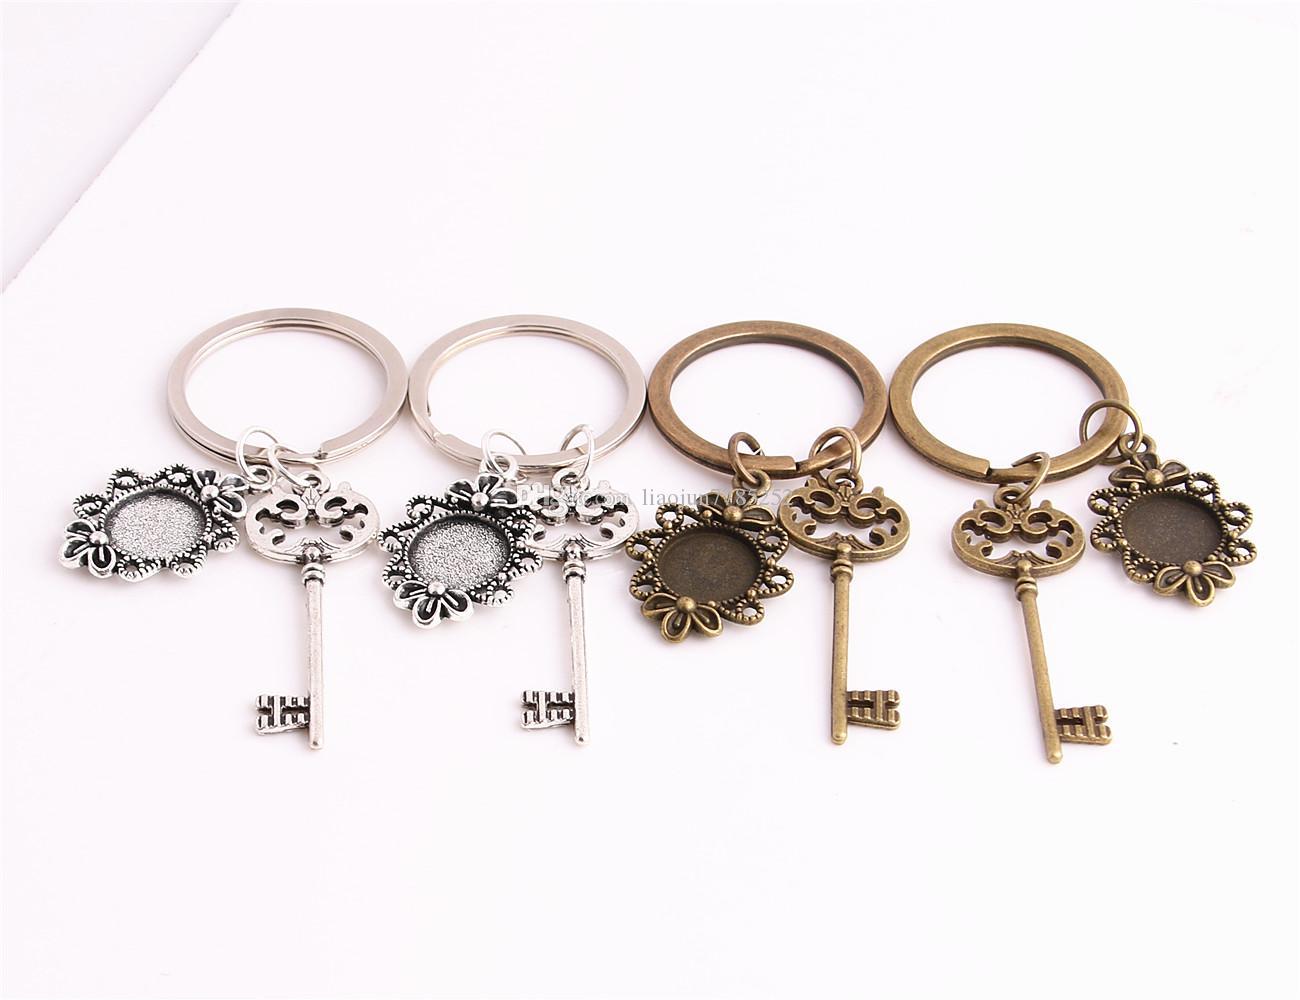 SWEET BELL 3pcs/lot Metal Alloy Zinc Key Chain Fit Round 12.5mm Cabochon Base Hollow Key Charm Pendant Jewelry Making C0903